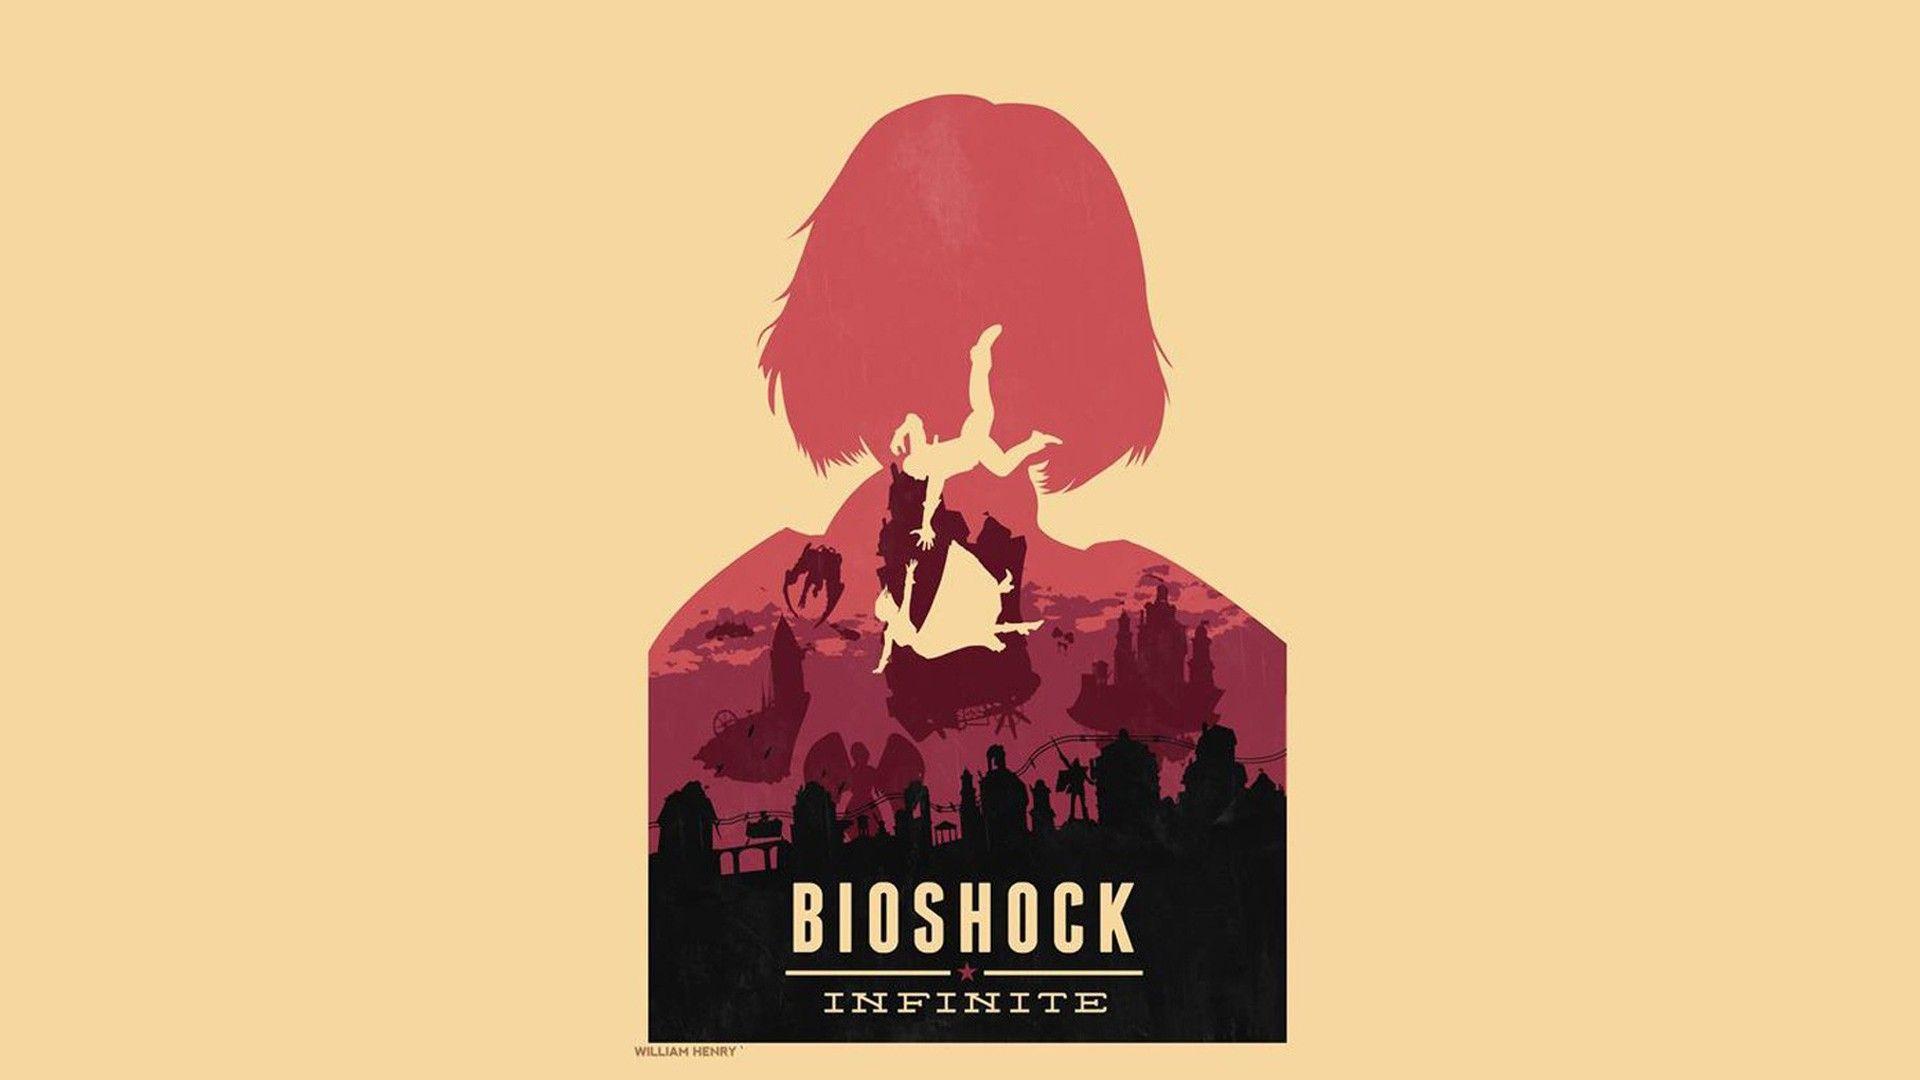 Bioshock Wallpapers Bioshock K Ultra Hd Desktop Photos 1280 960 Bioshock Desktop Wallpapers 36 Wallpap Bioshock Infinite Bioshock Bioshock Infinite Elizabeth